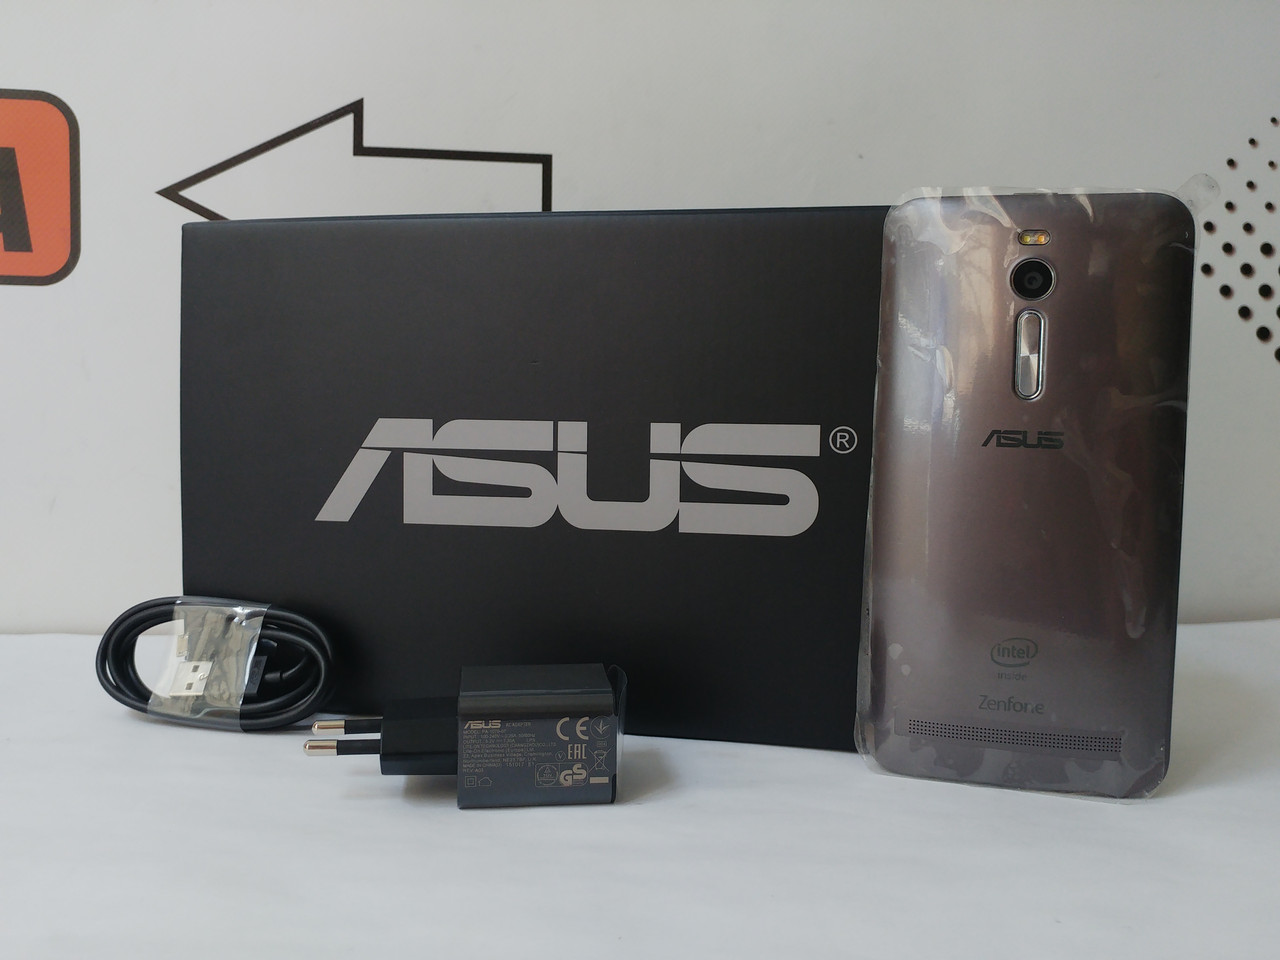 "Смартфон Asus Zenfone 2, 5.5"" IPS, Intel Atom Z3560, 4ГБ/16ГБ, NFC, гарантия 9 мес."